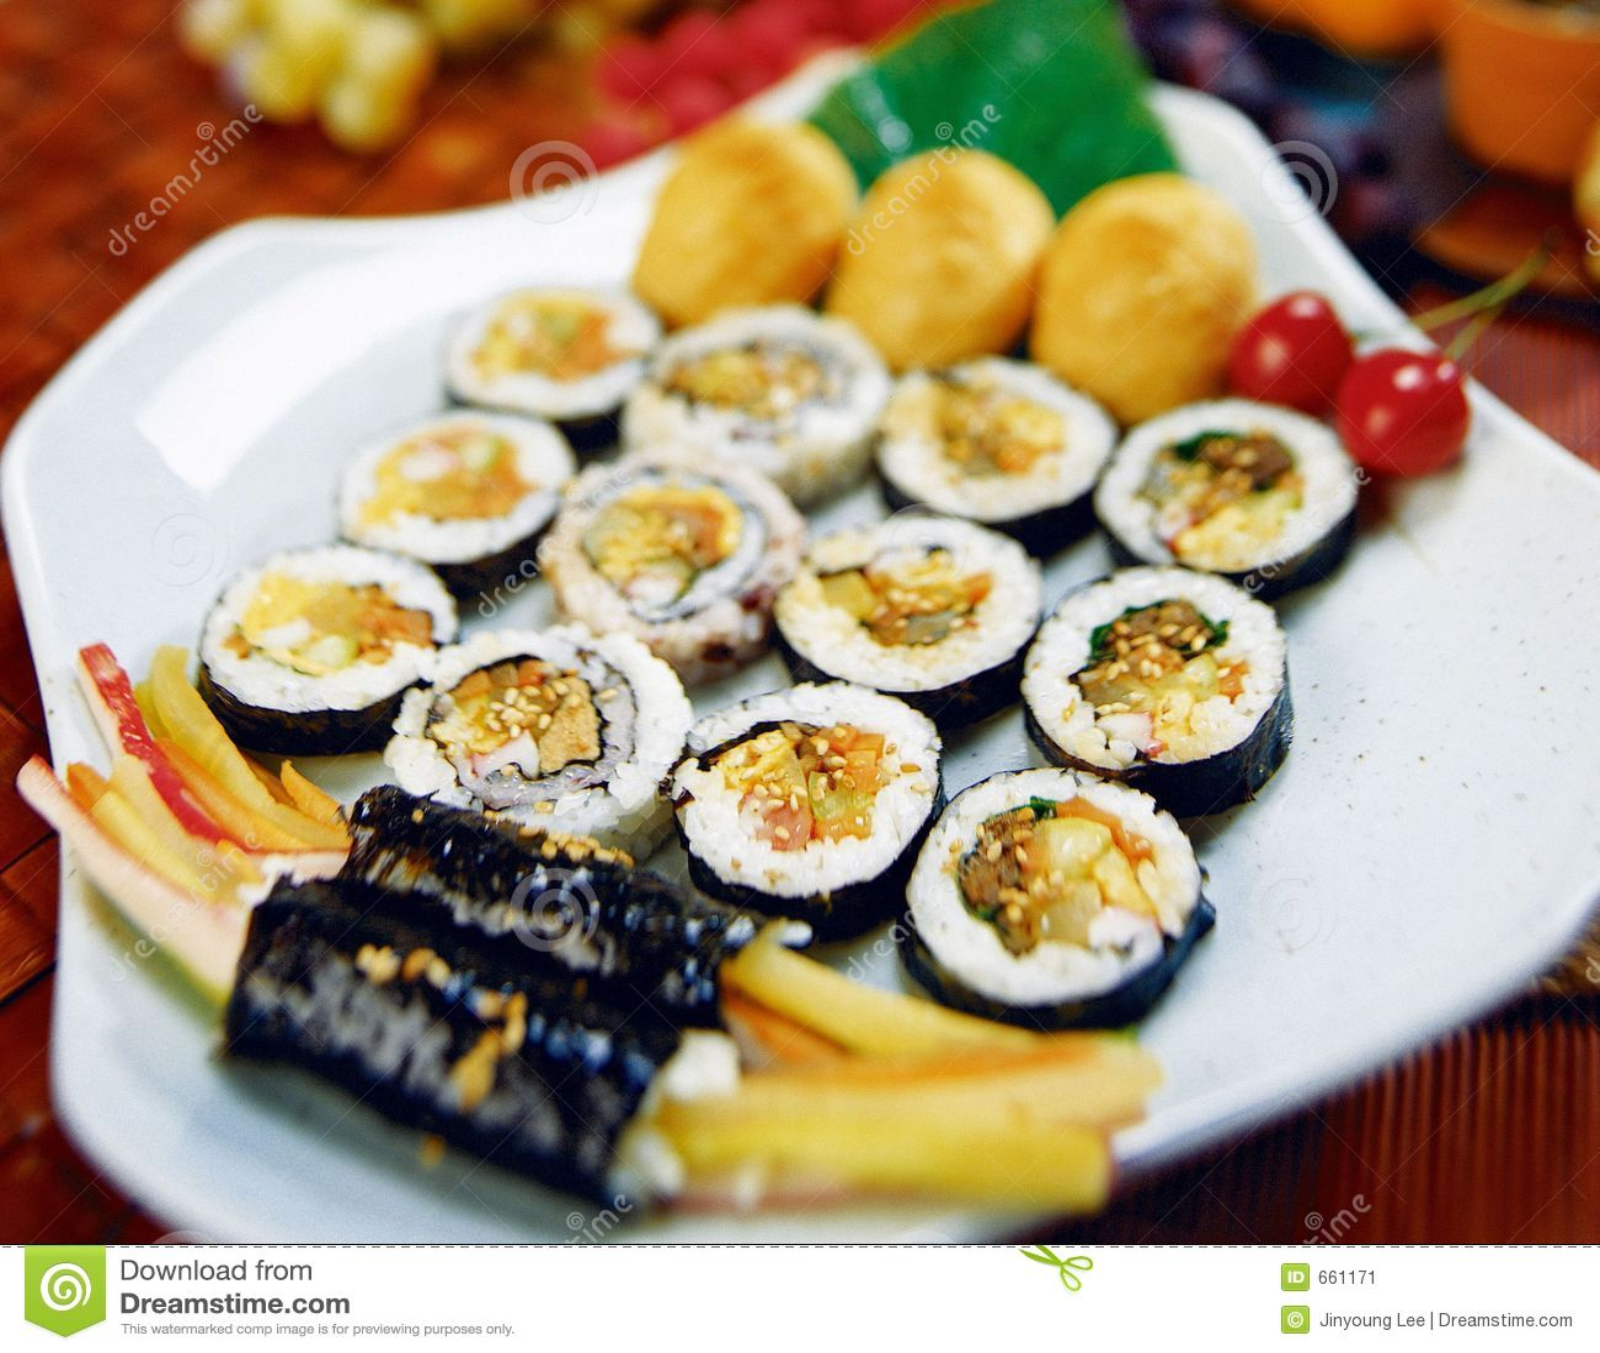 Korean Food Stock Image - Image: 661171